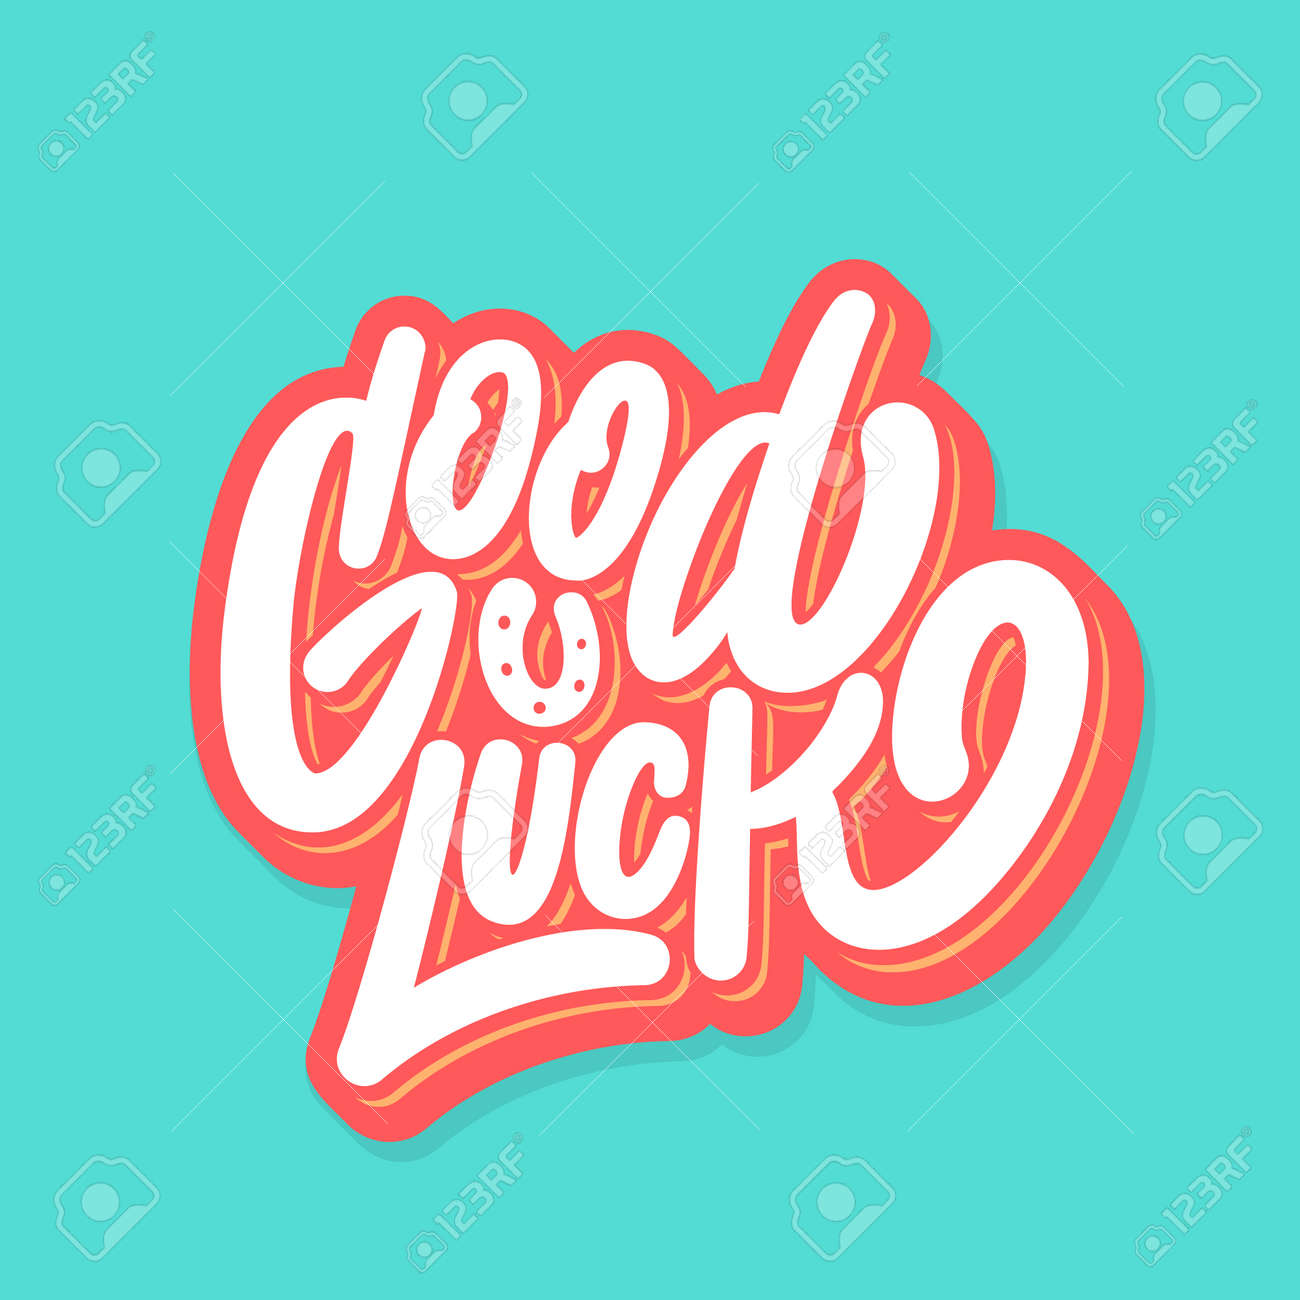 Good luck. Farewell card. Vector lettering. - 150343923